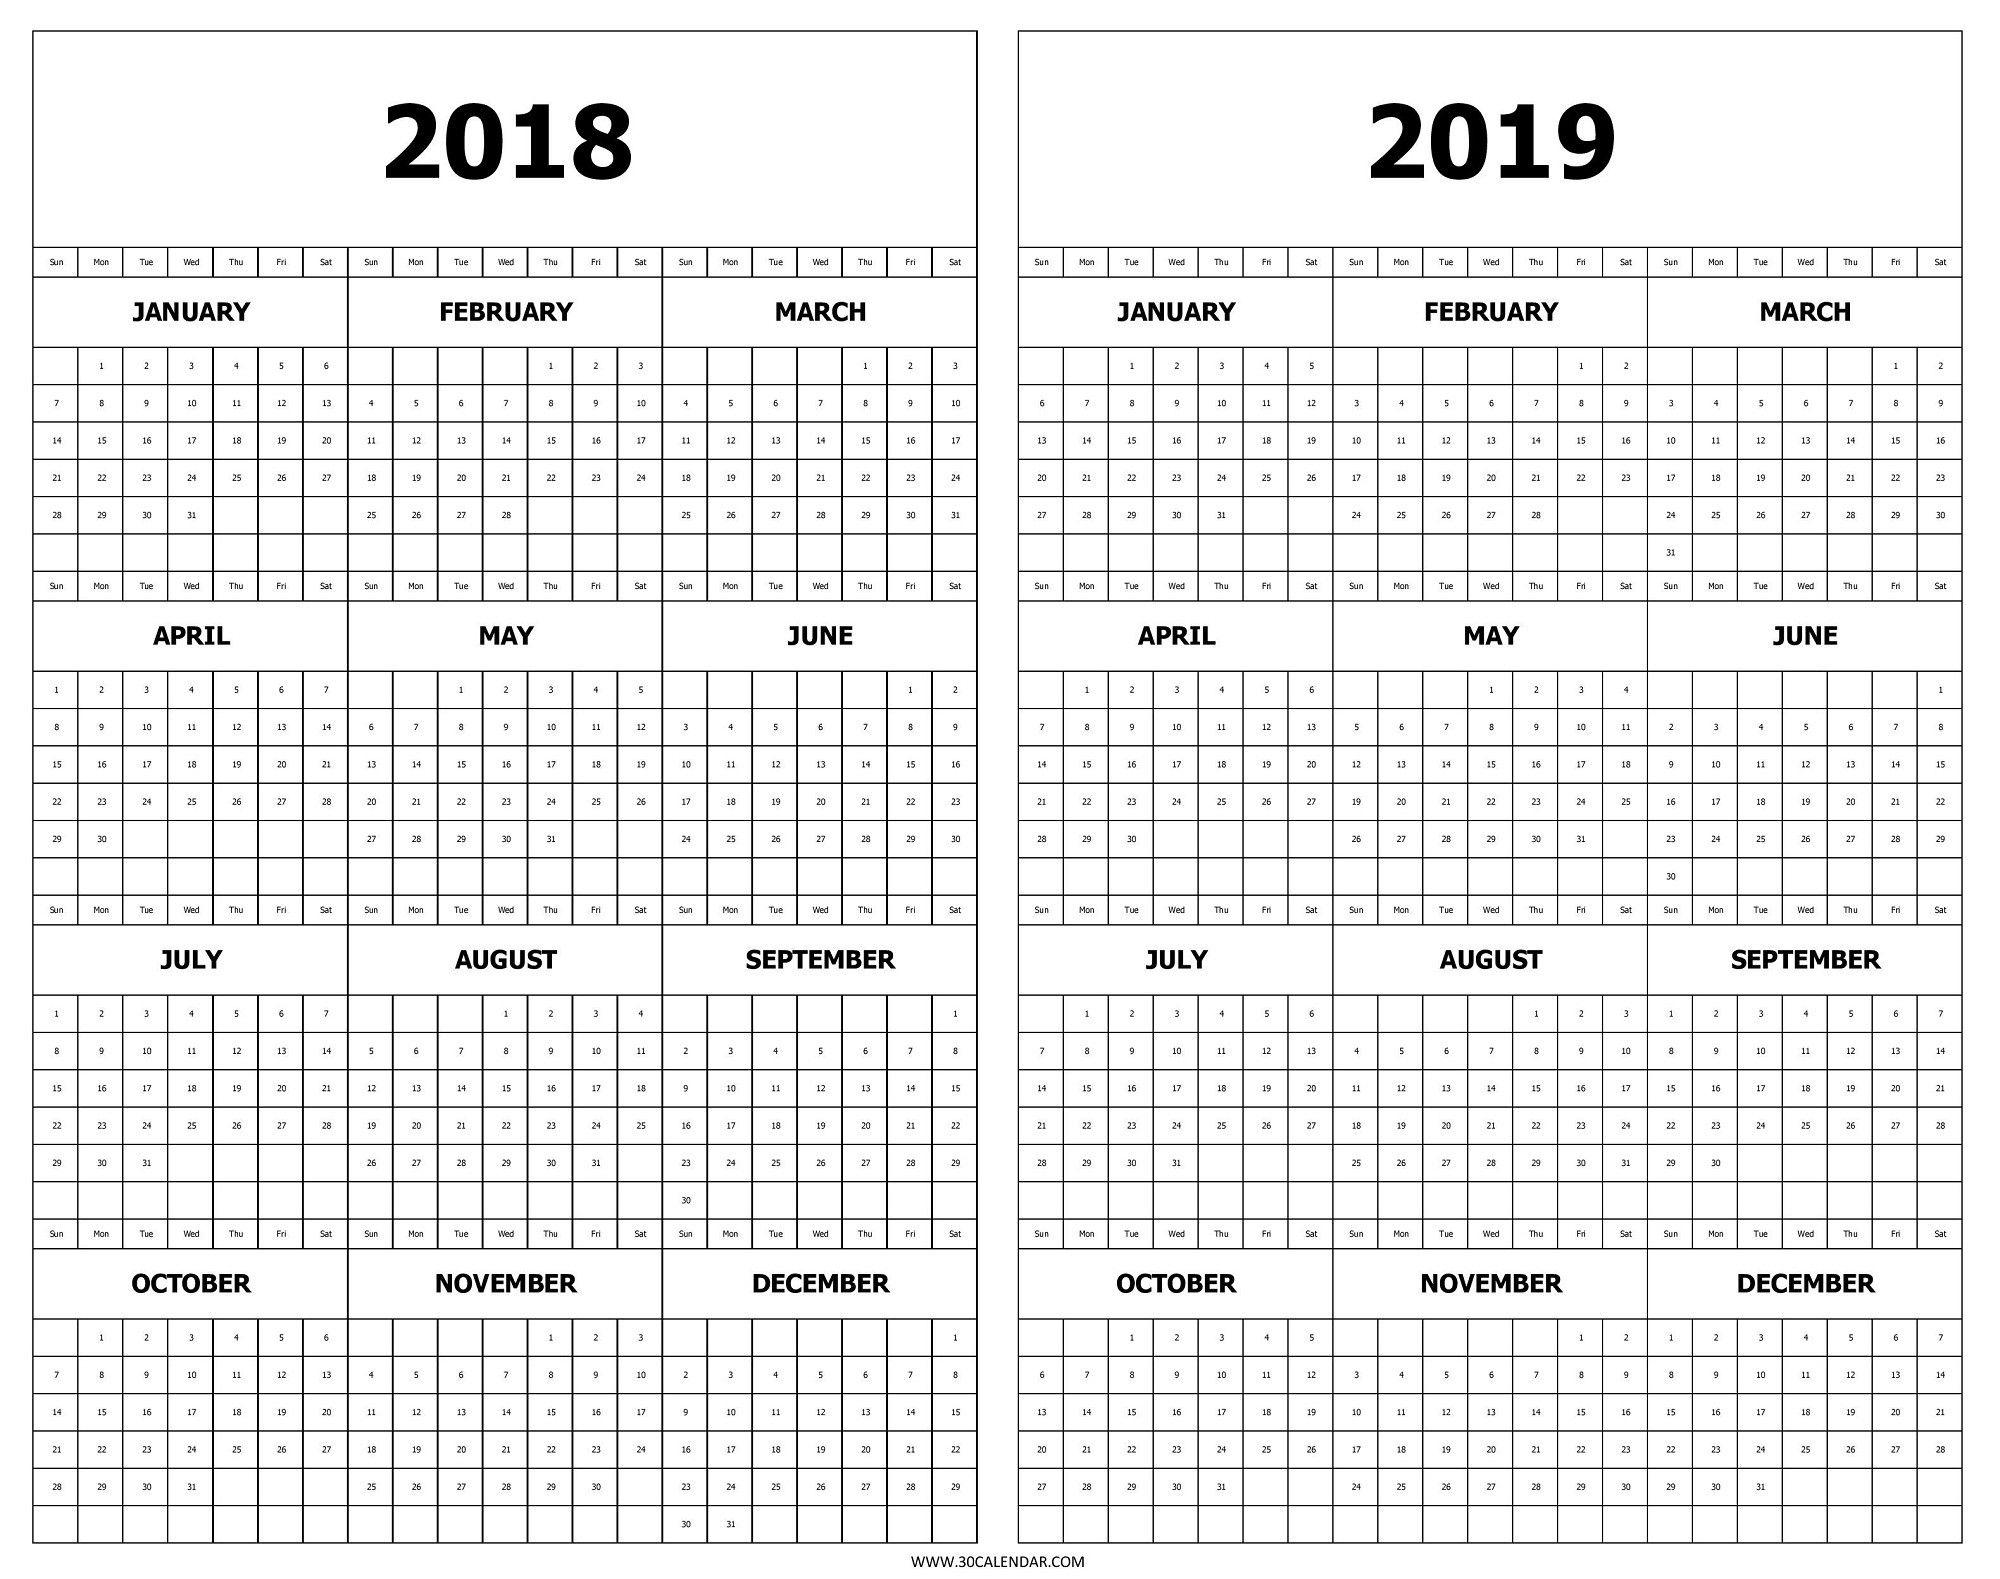 Free Printable Calendar At A Glance In 2020 | Calendar June